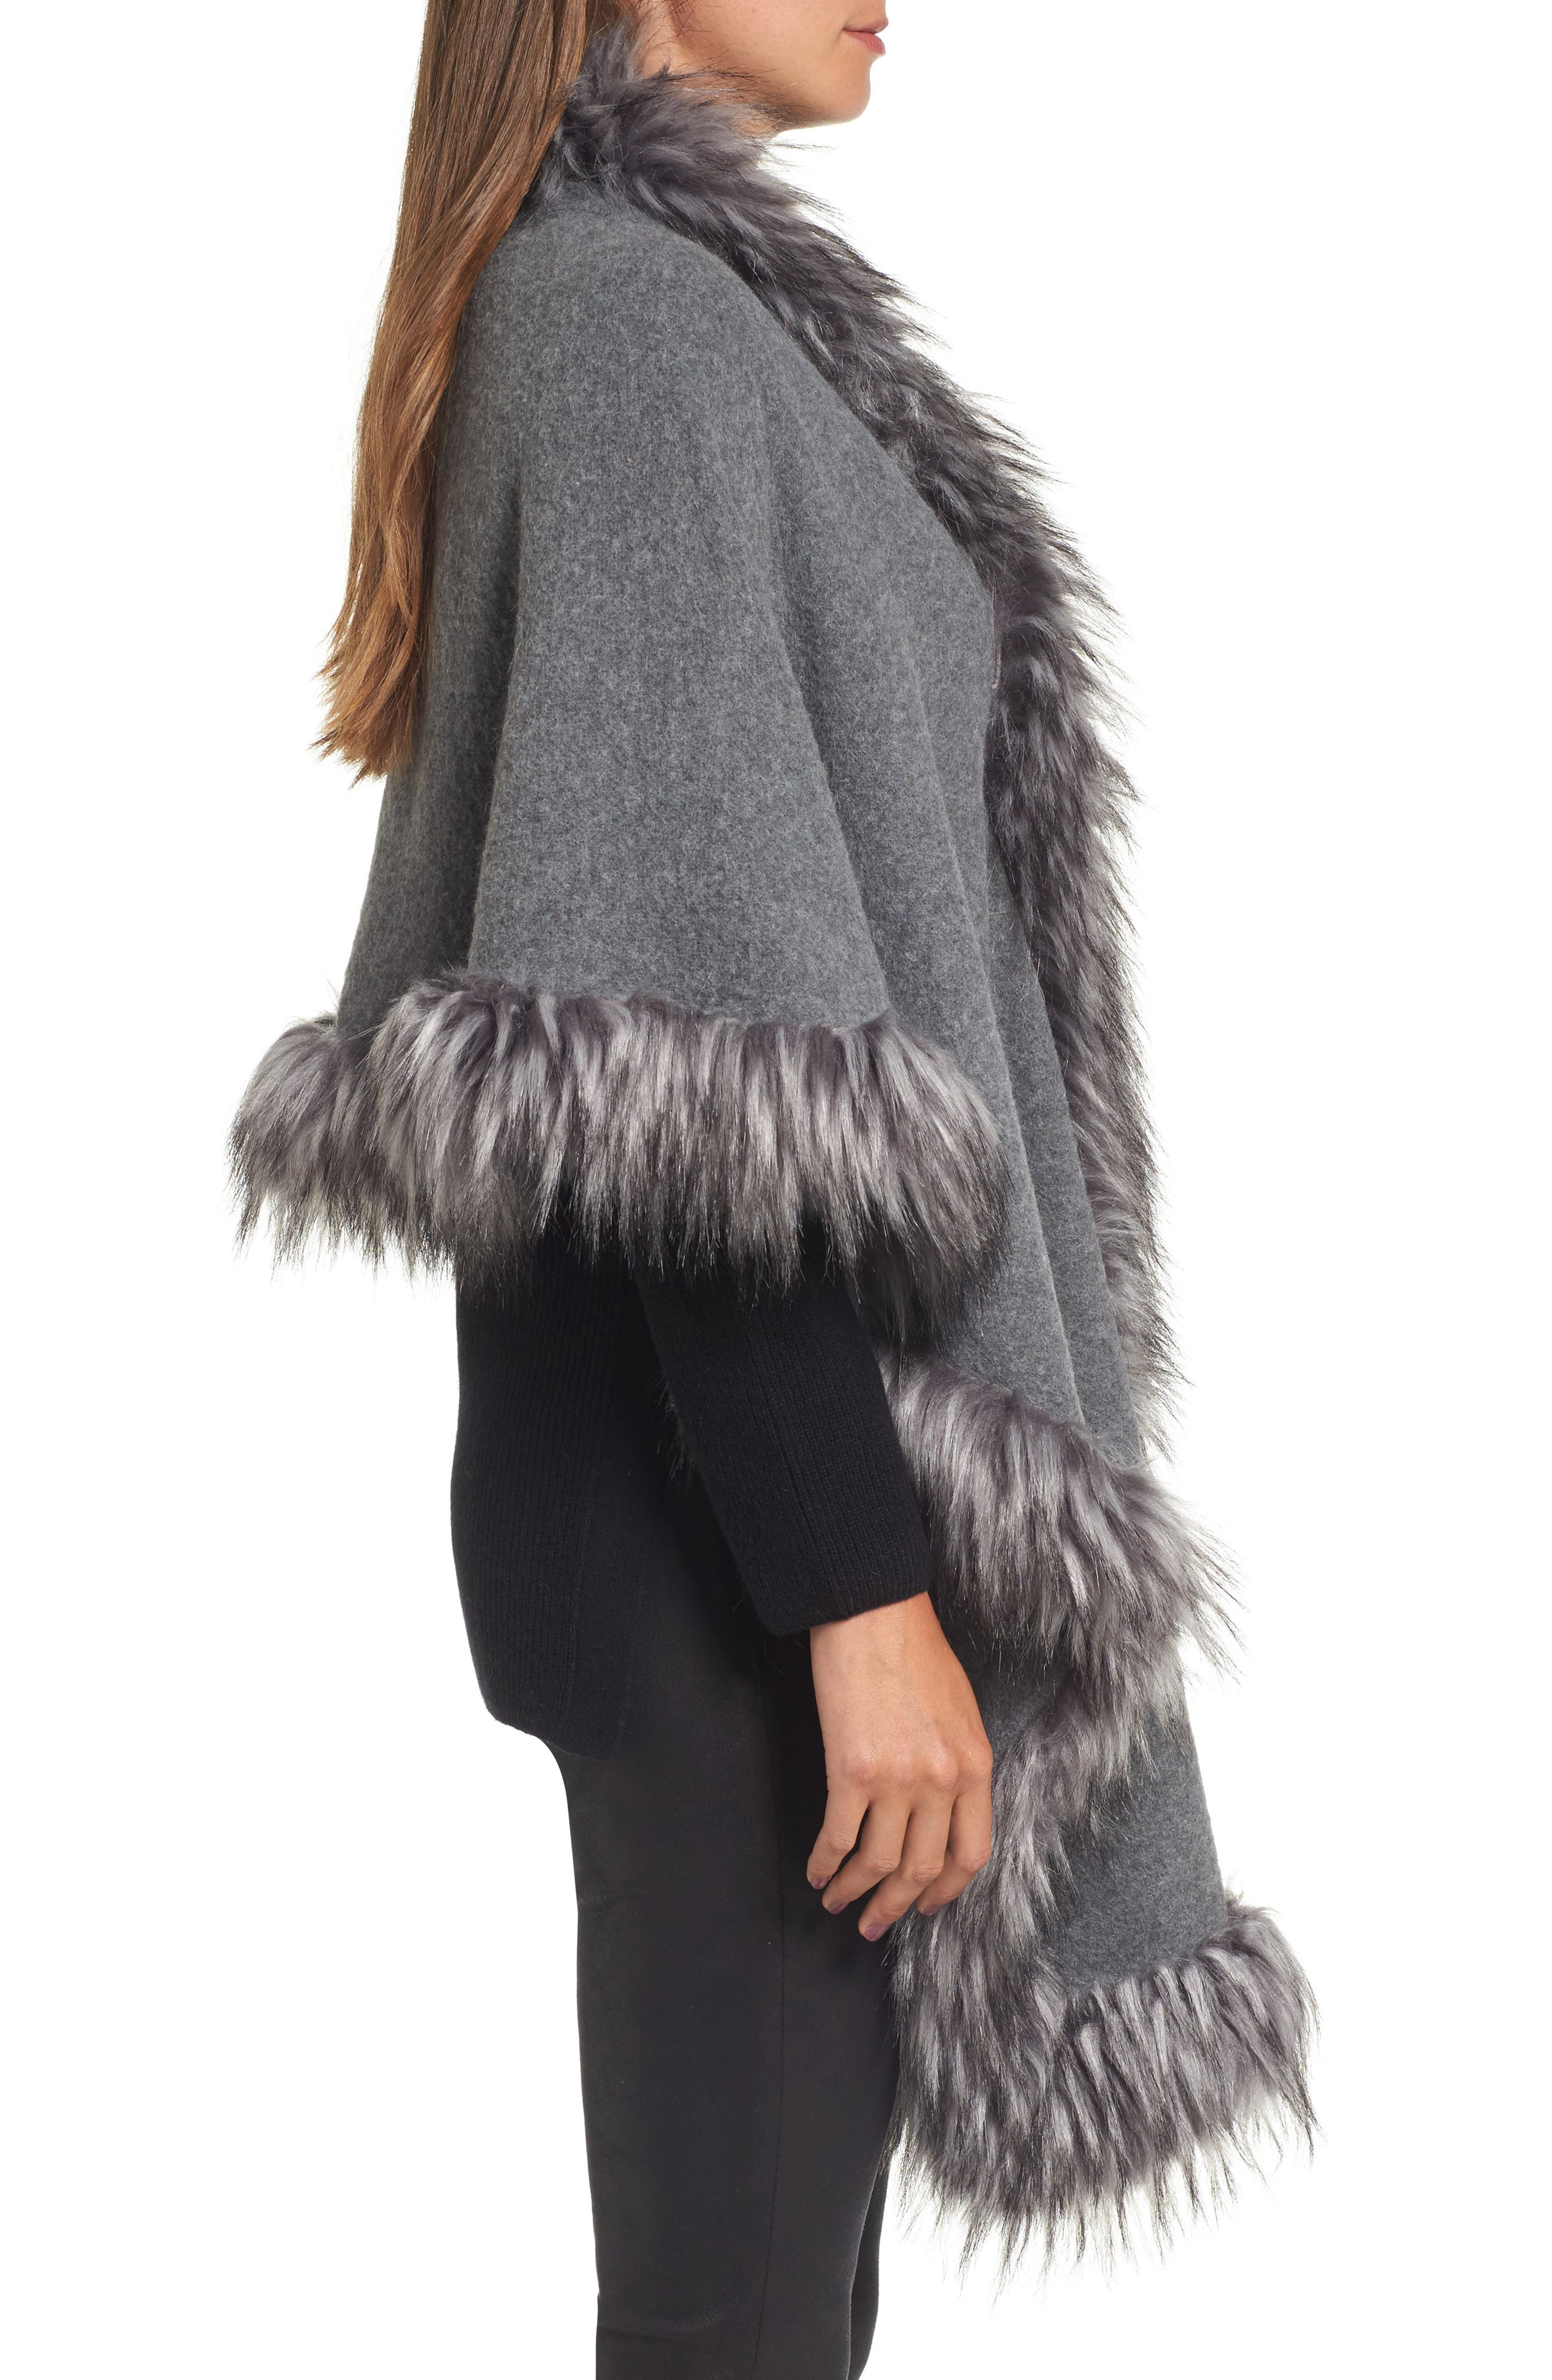 Knit Poncho with Faux Fur Trim,                             Alternate thumbnail 3, color,                             030